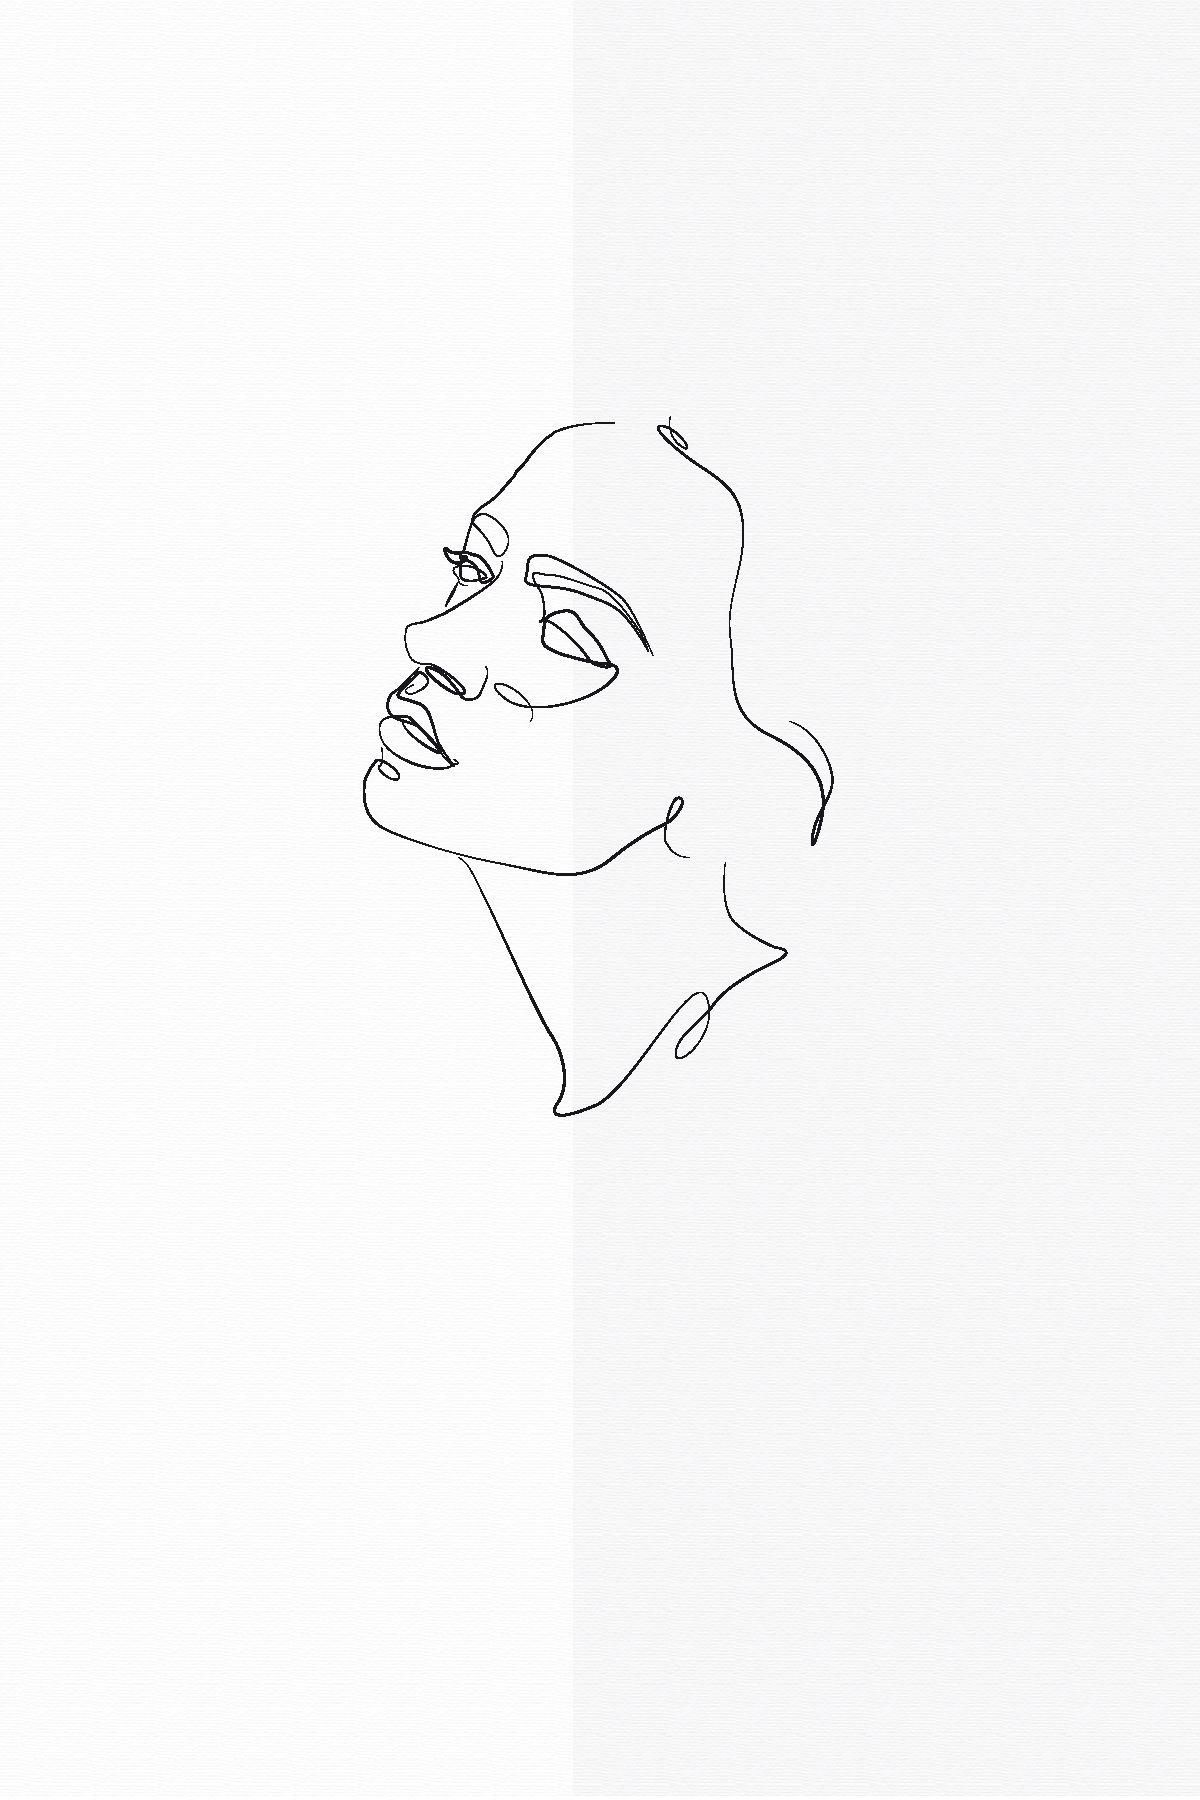 Minimalist Drawings Beautiful Line Art And Simple Sketches In 2020 Minimalist Drawing Abstract Line Art Minimalist Wallpaper